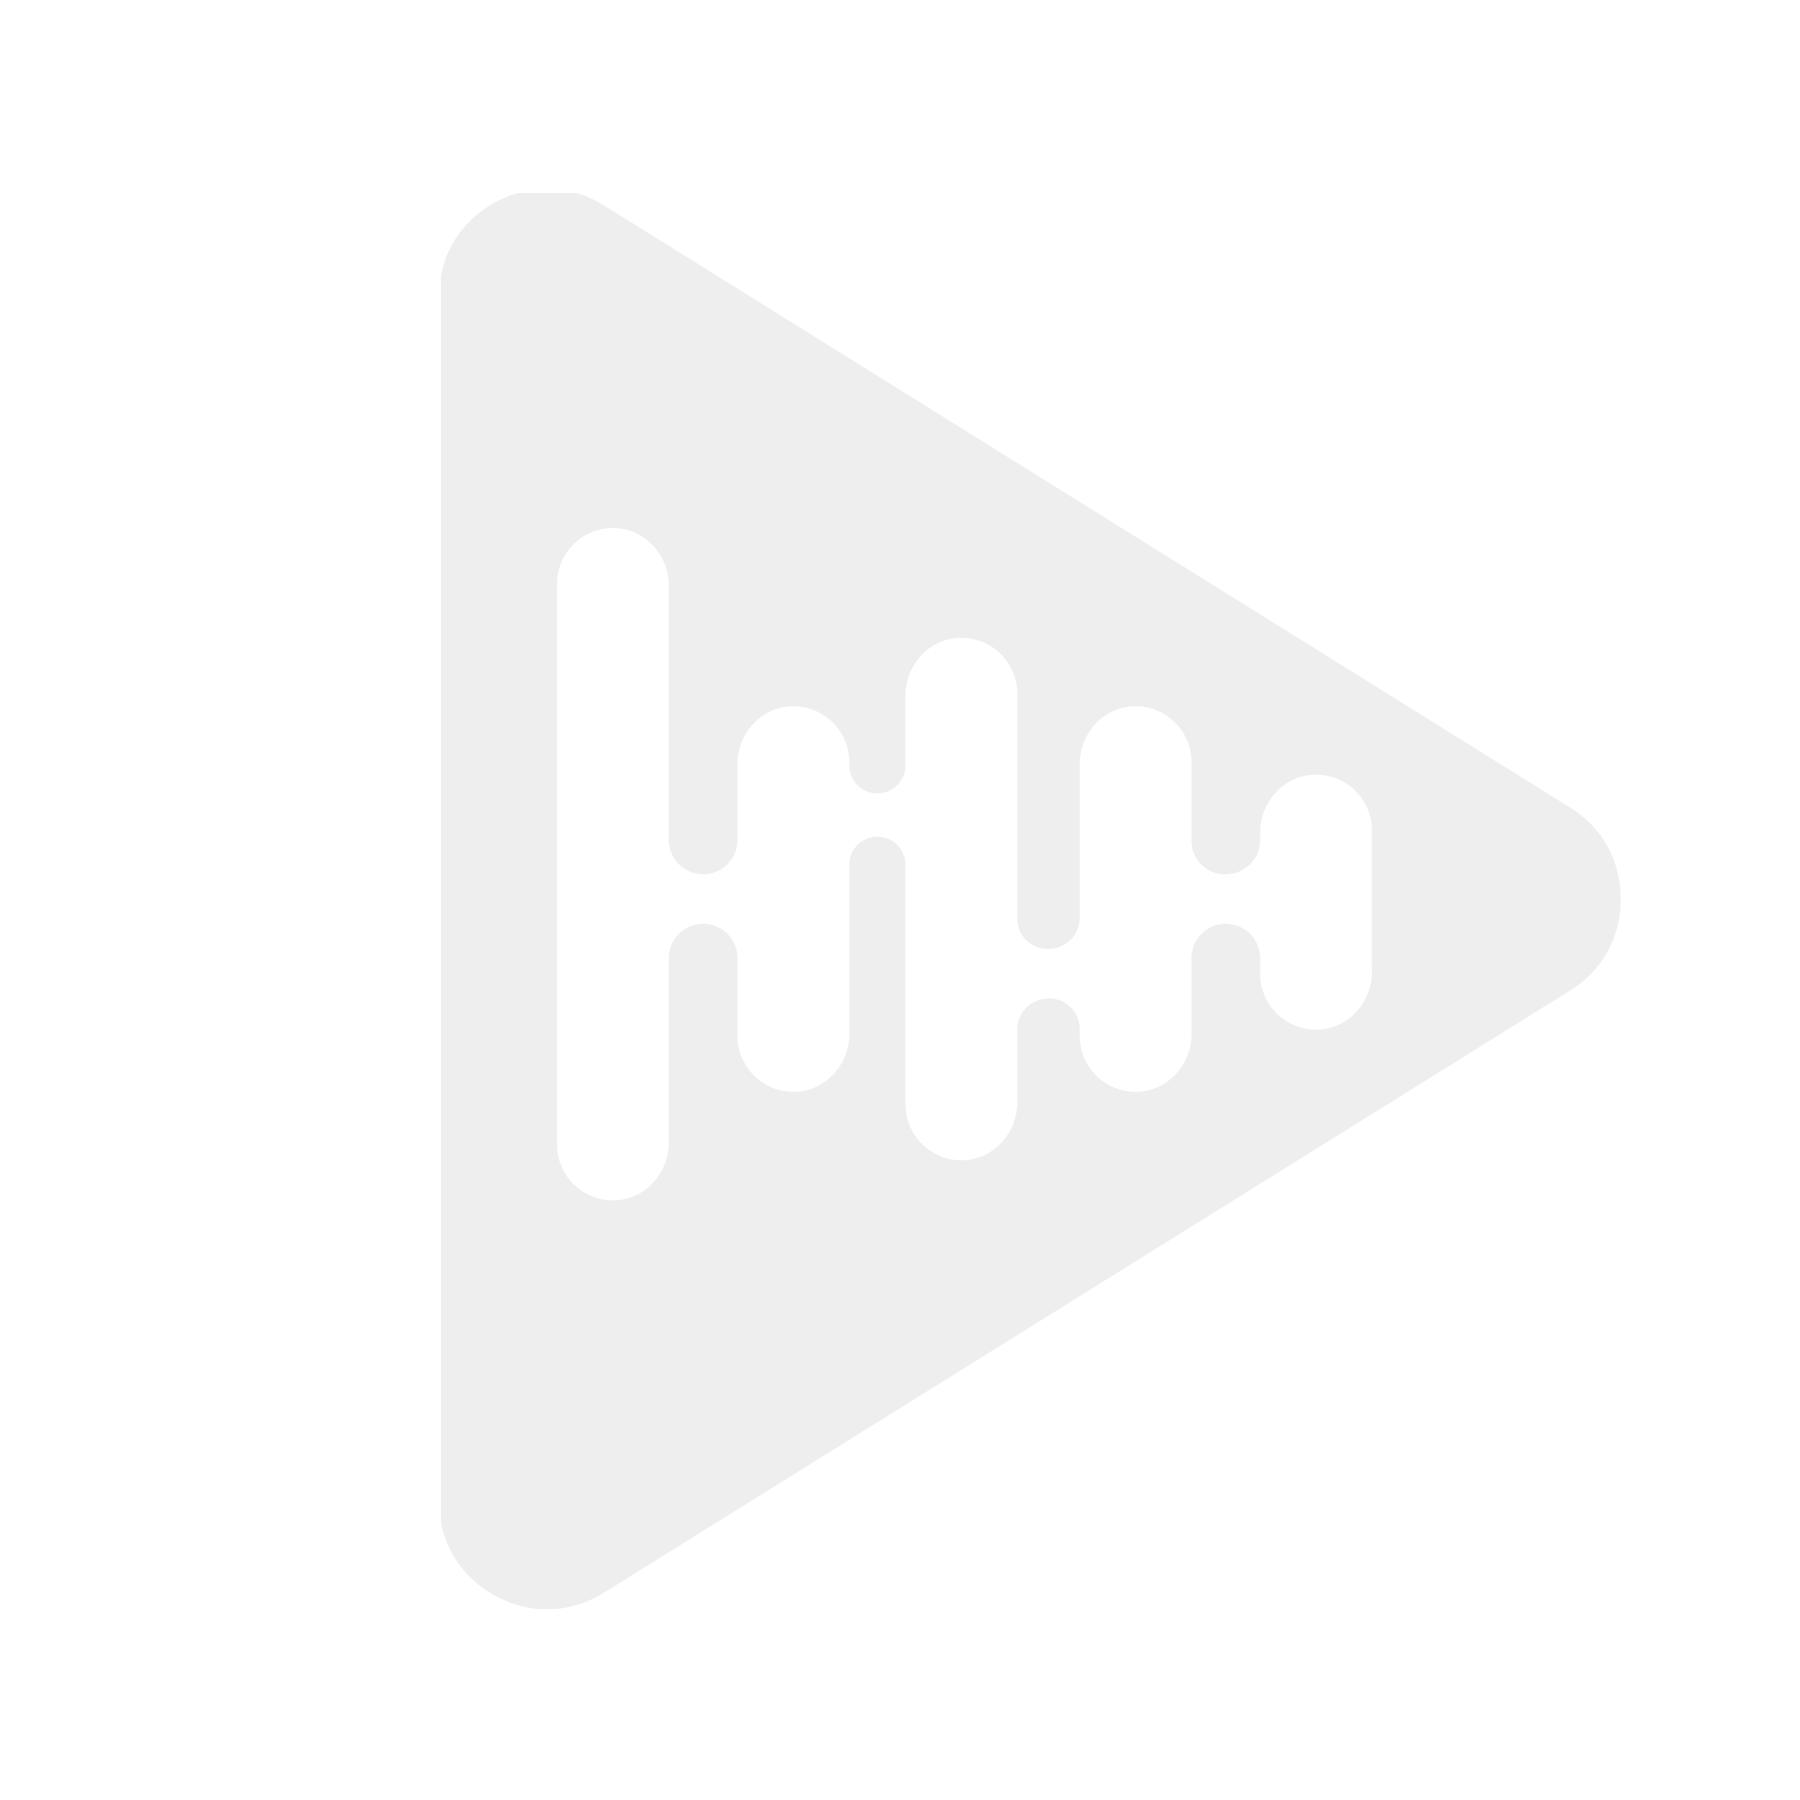 Connect GR00004 - Universal høyttalergrill, 165mm/6,5